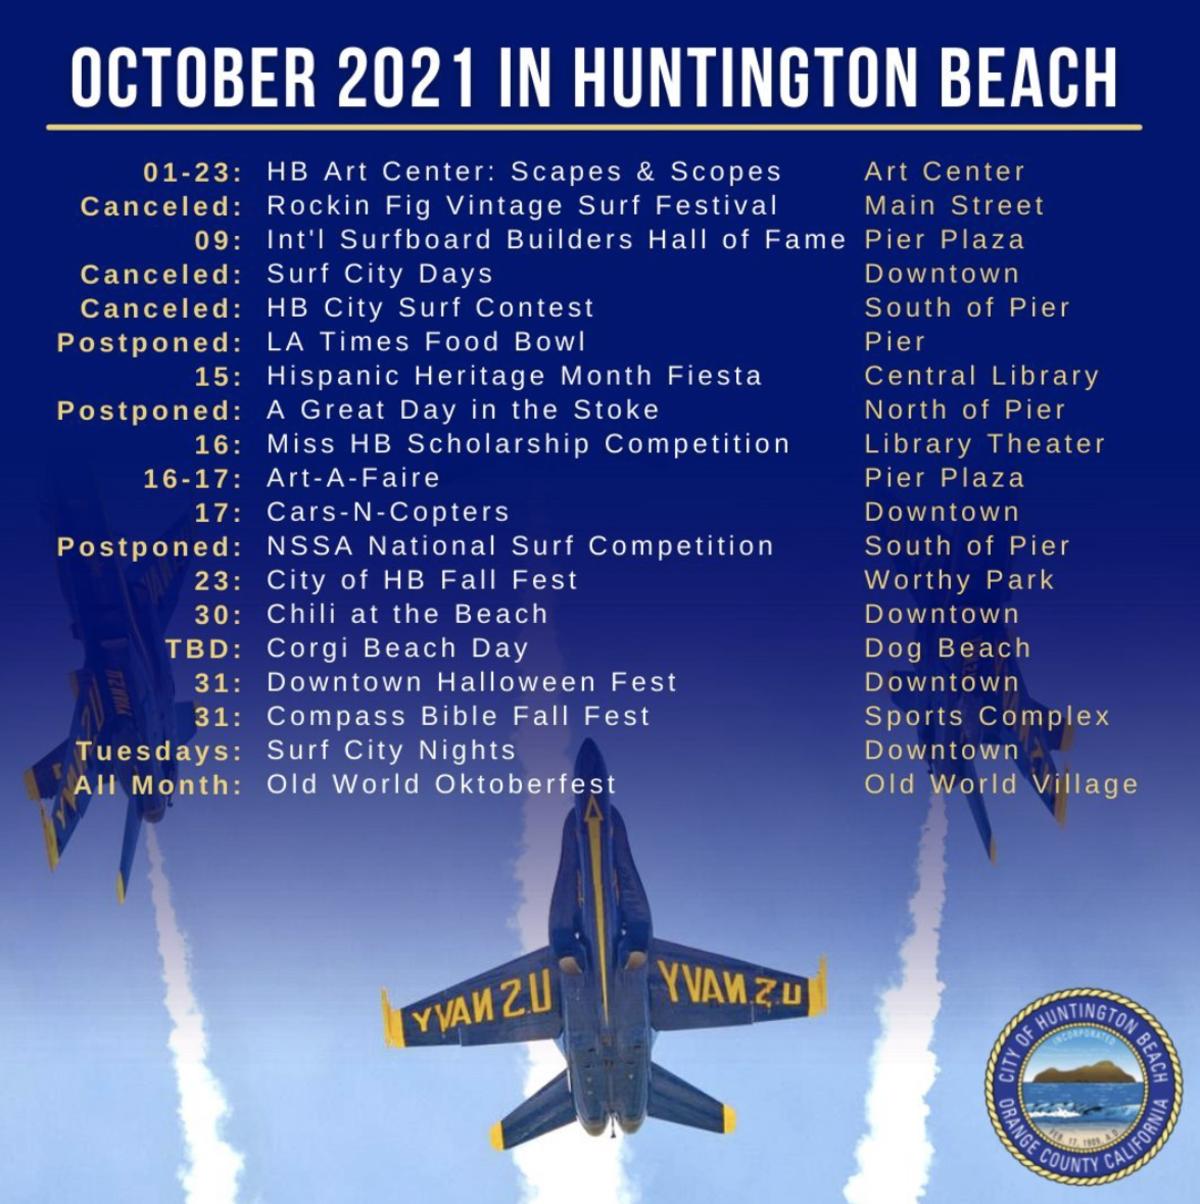 October Event Calendar in Huntington Beach